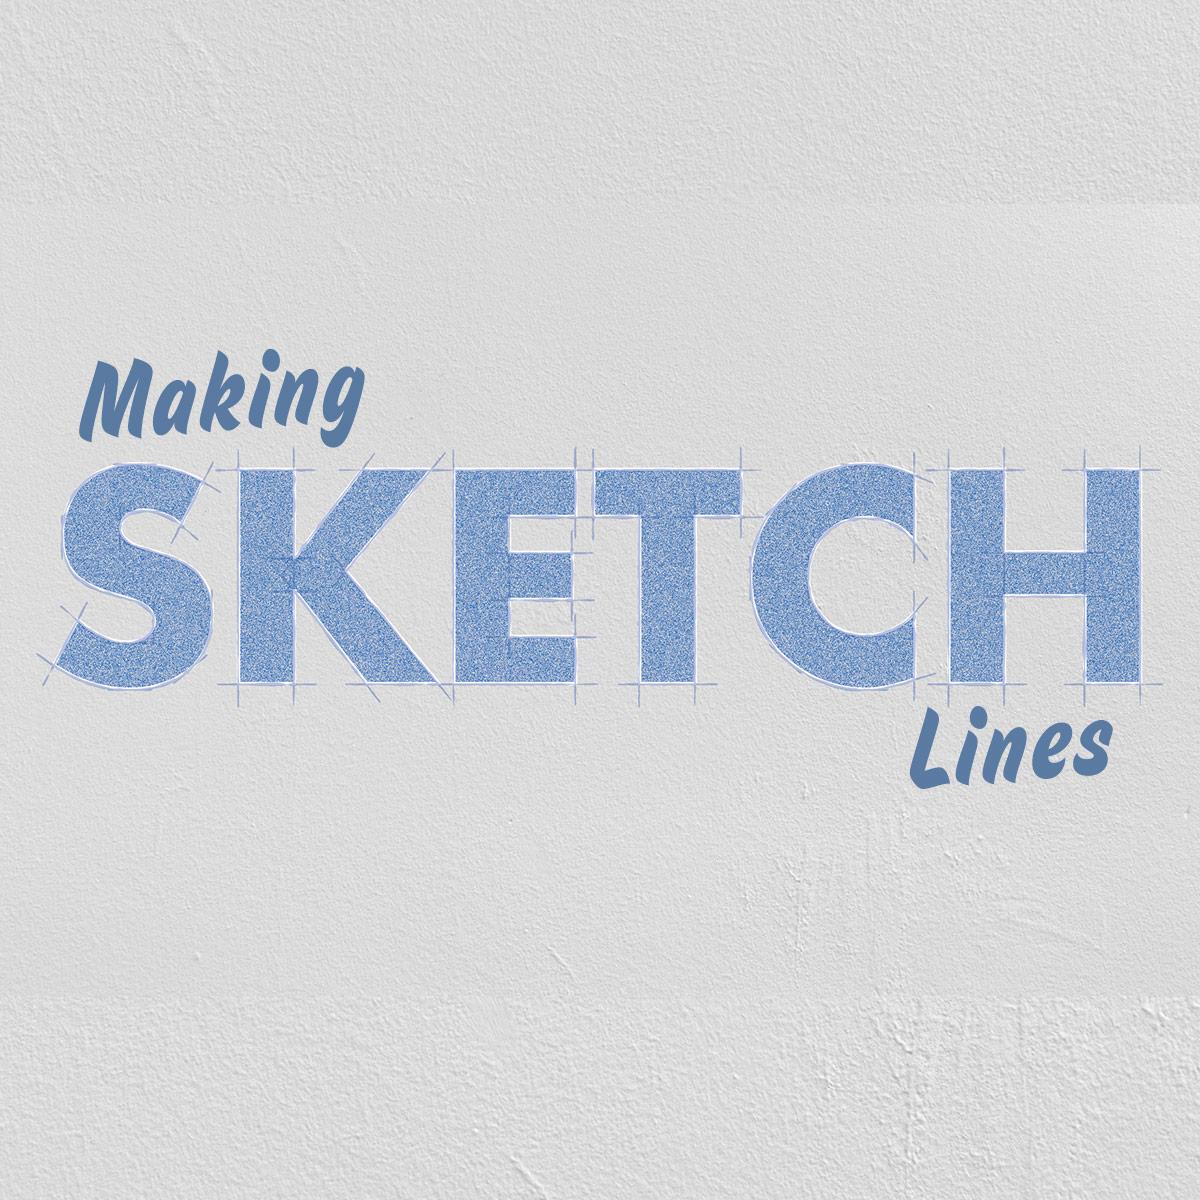 10 Min Skills - Making sketch lines